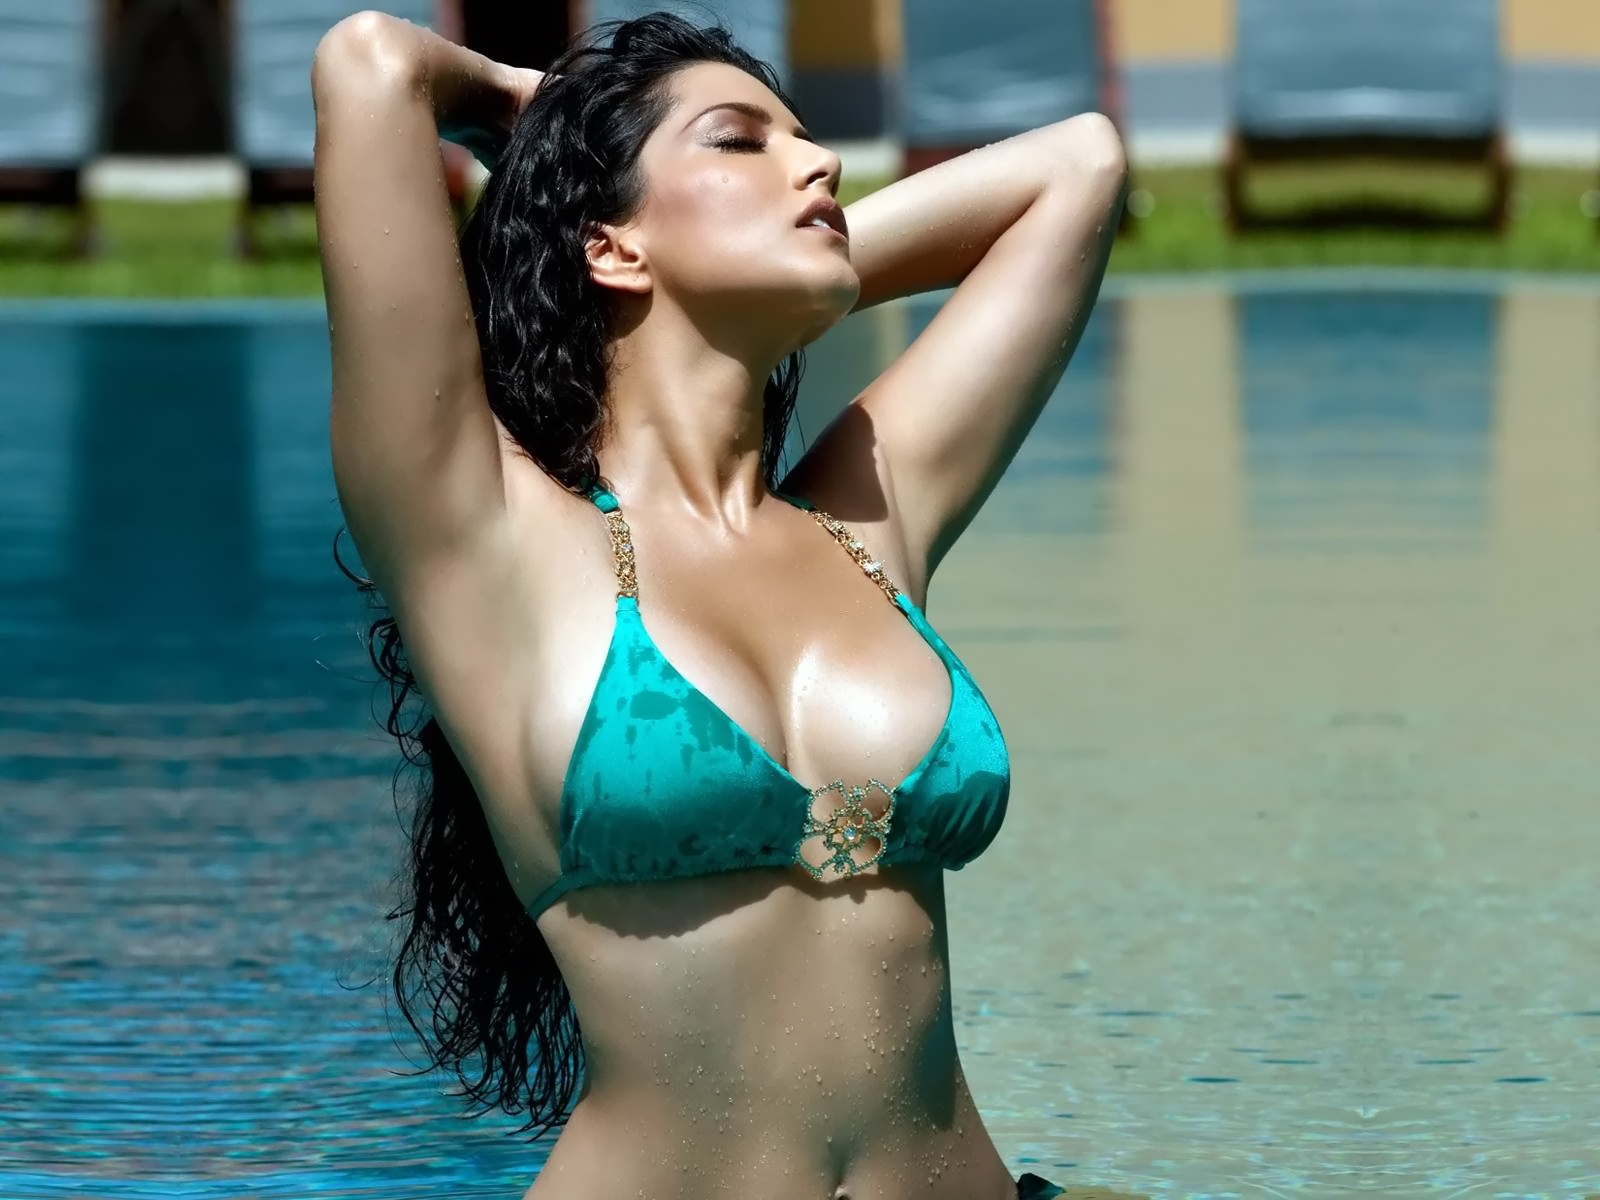 Hot Sunny Leone in Jism 2